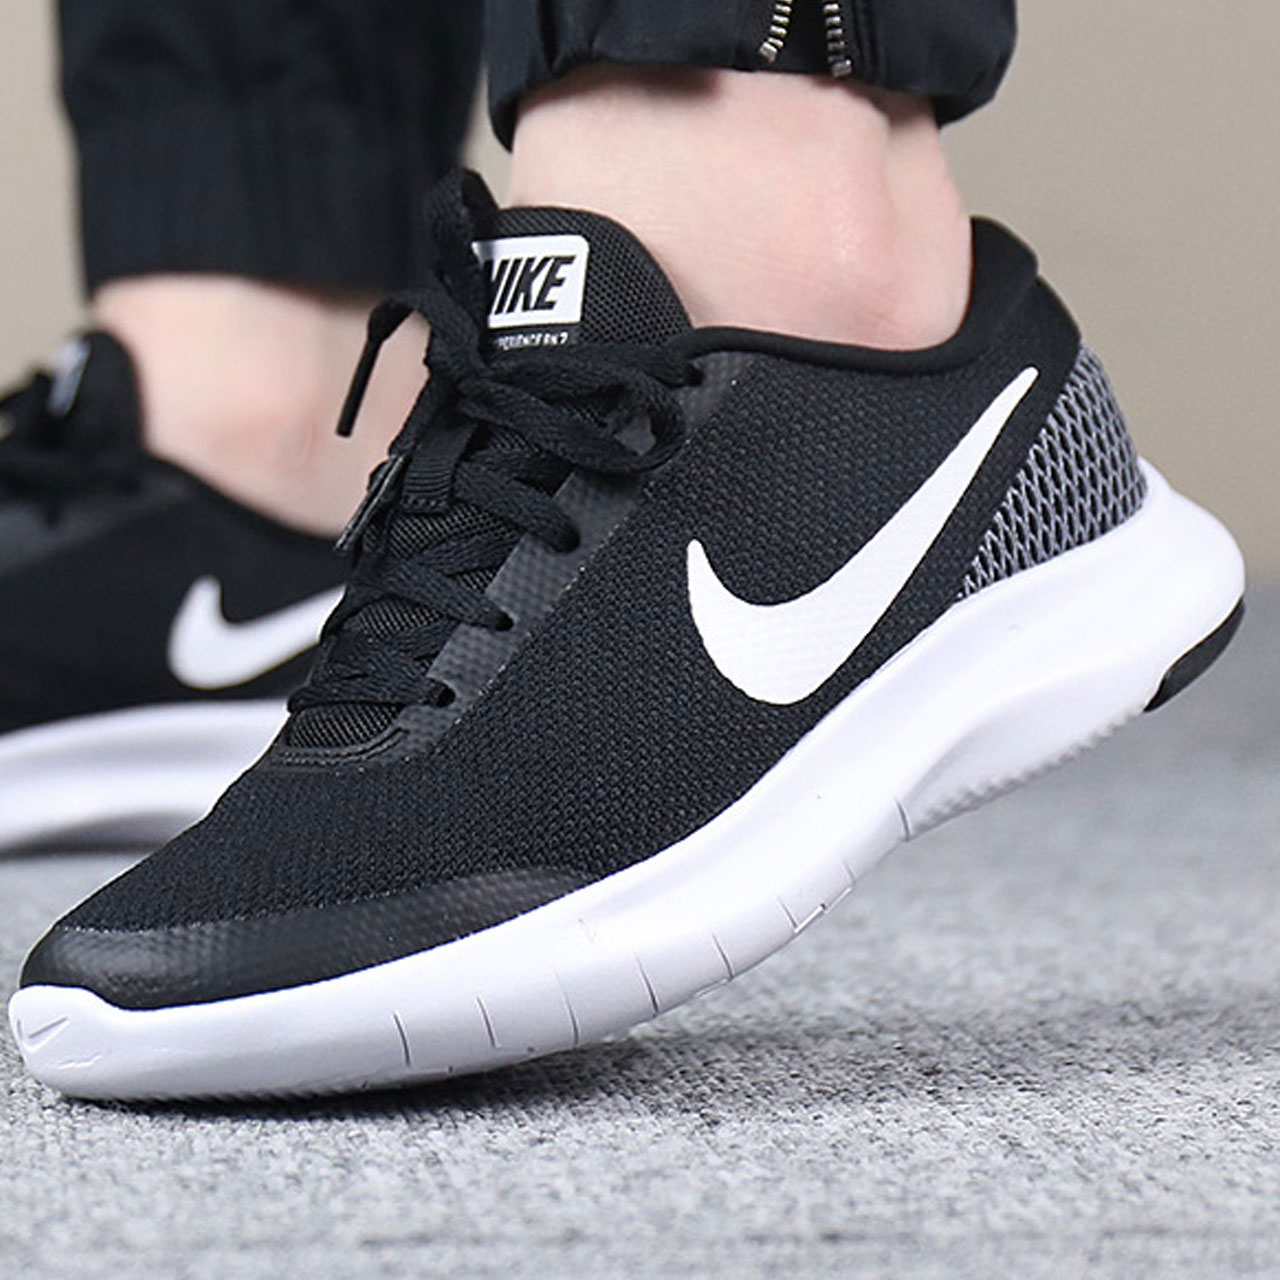 Nike耐克女鞋2018秋季新款FREE赤足跑鞋休闲运动鞋透气轻便跑步鞋